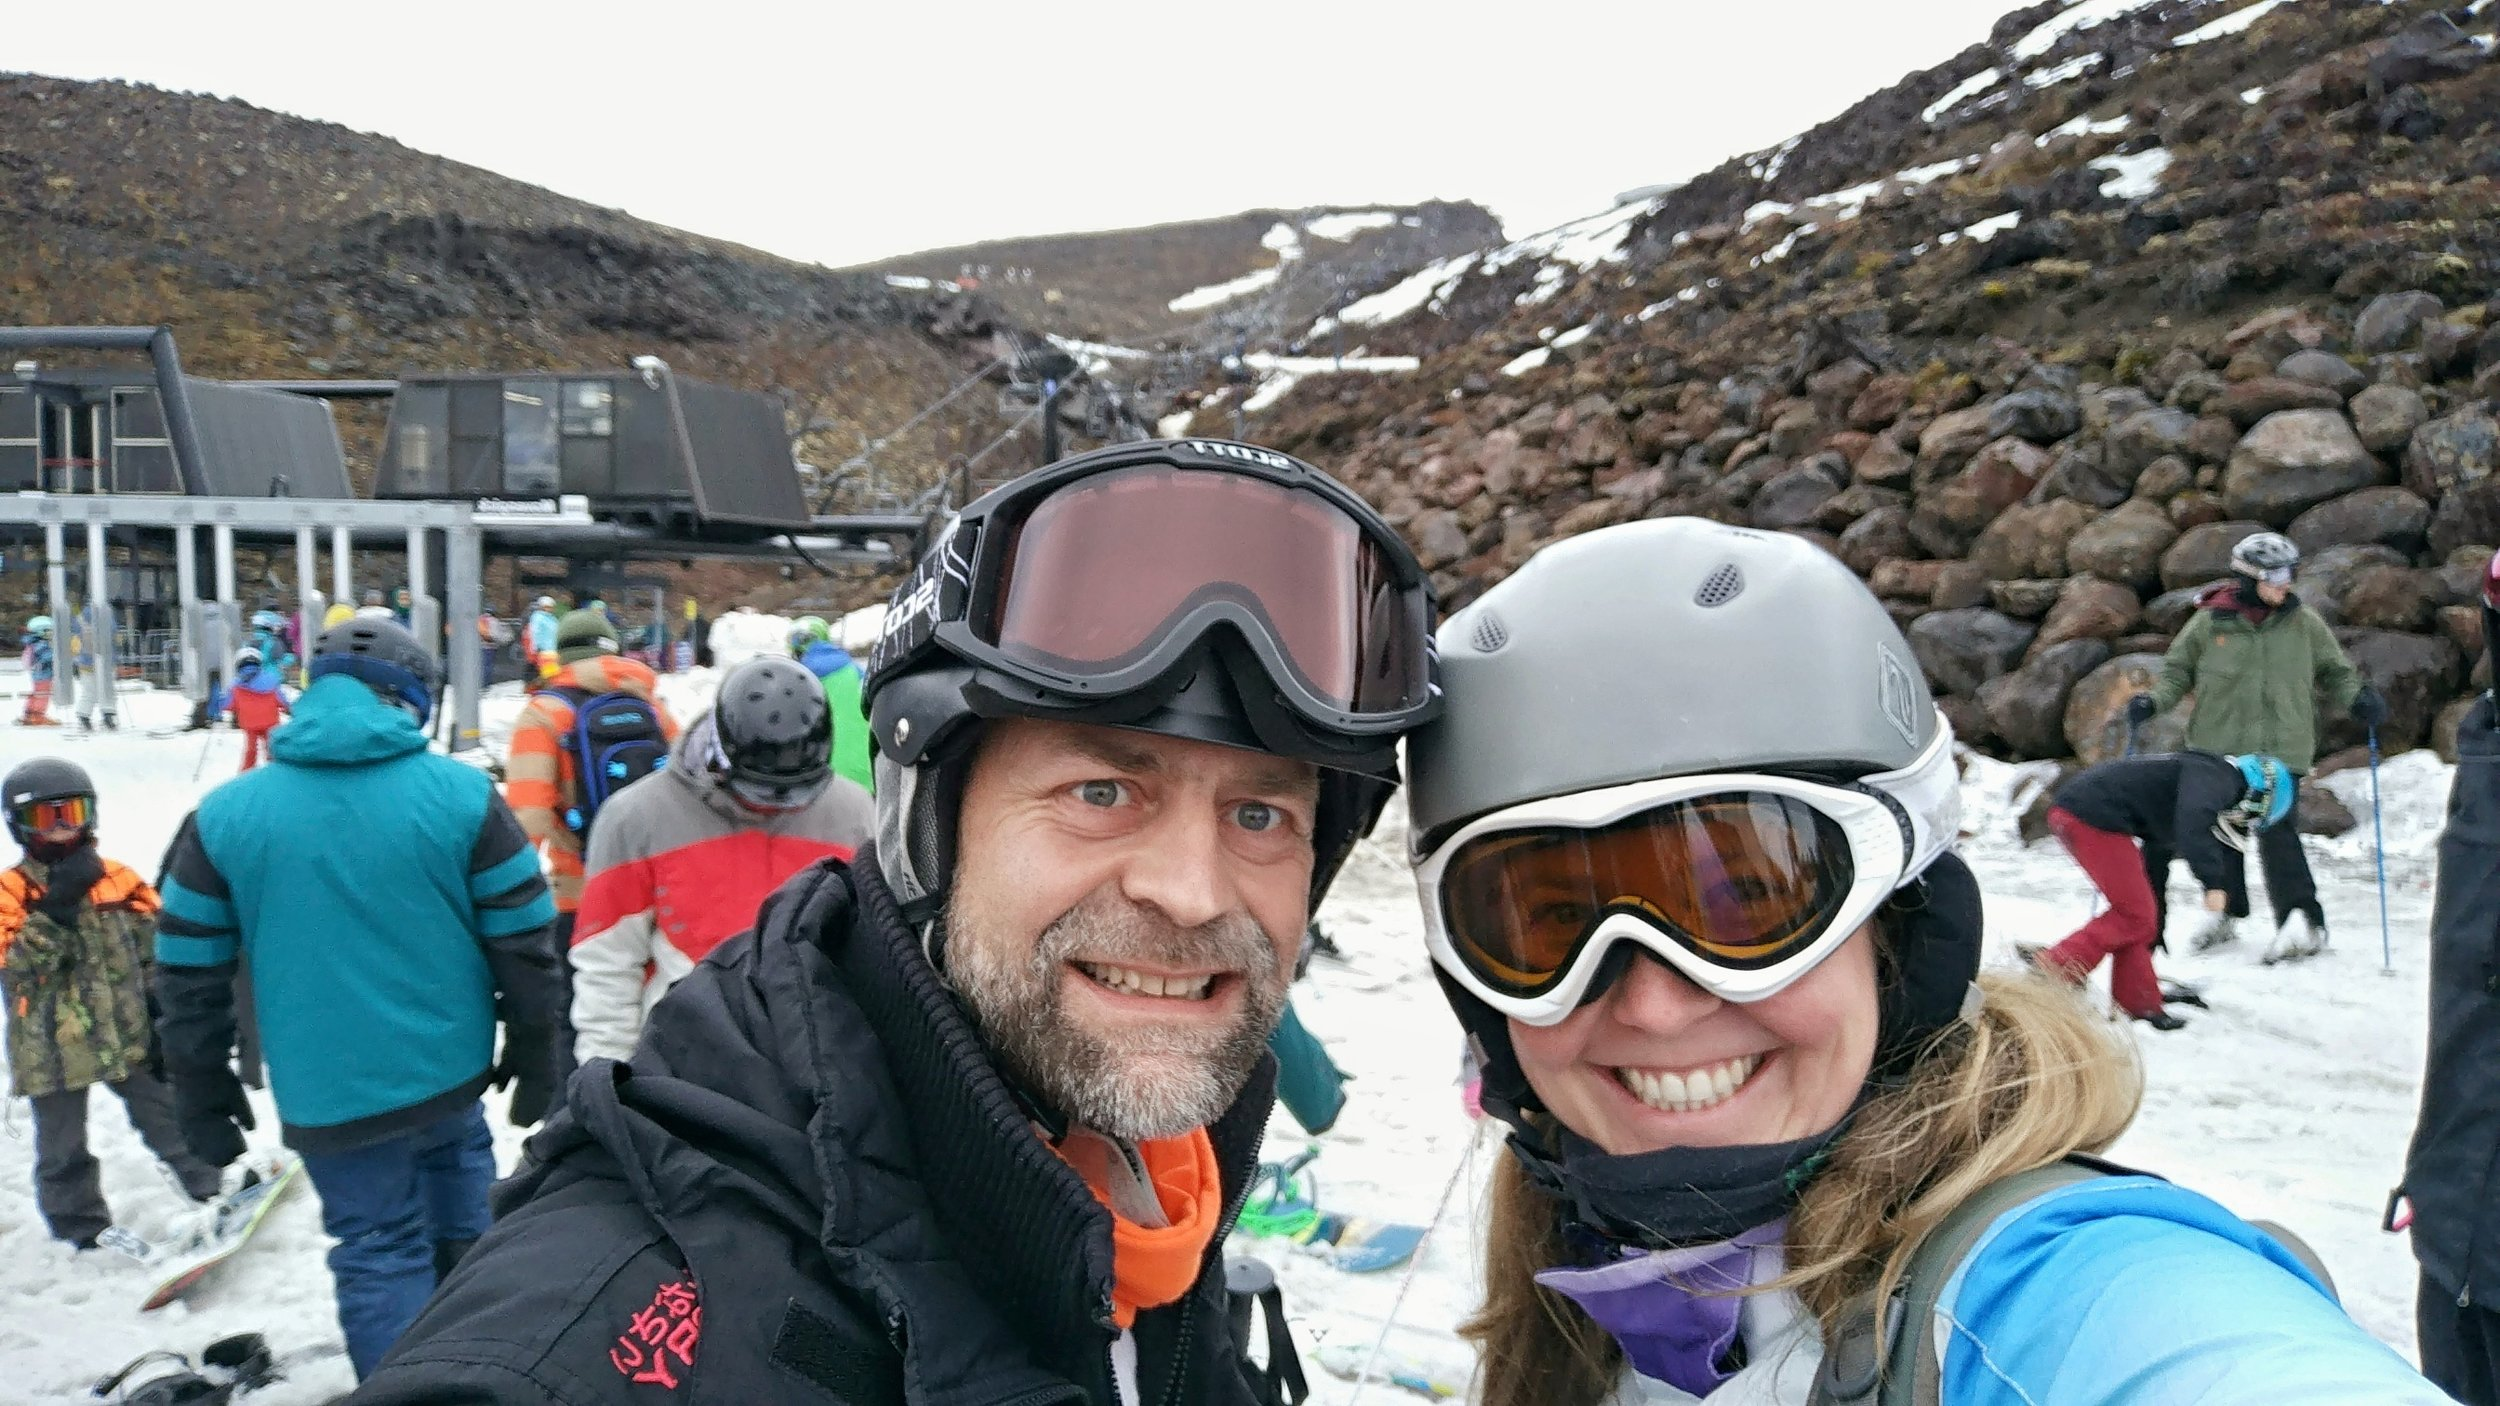 Spring skiing on Mt. Ruapehu (Turoa ski field)